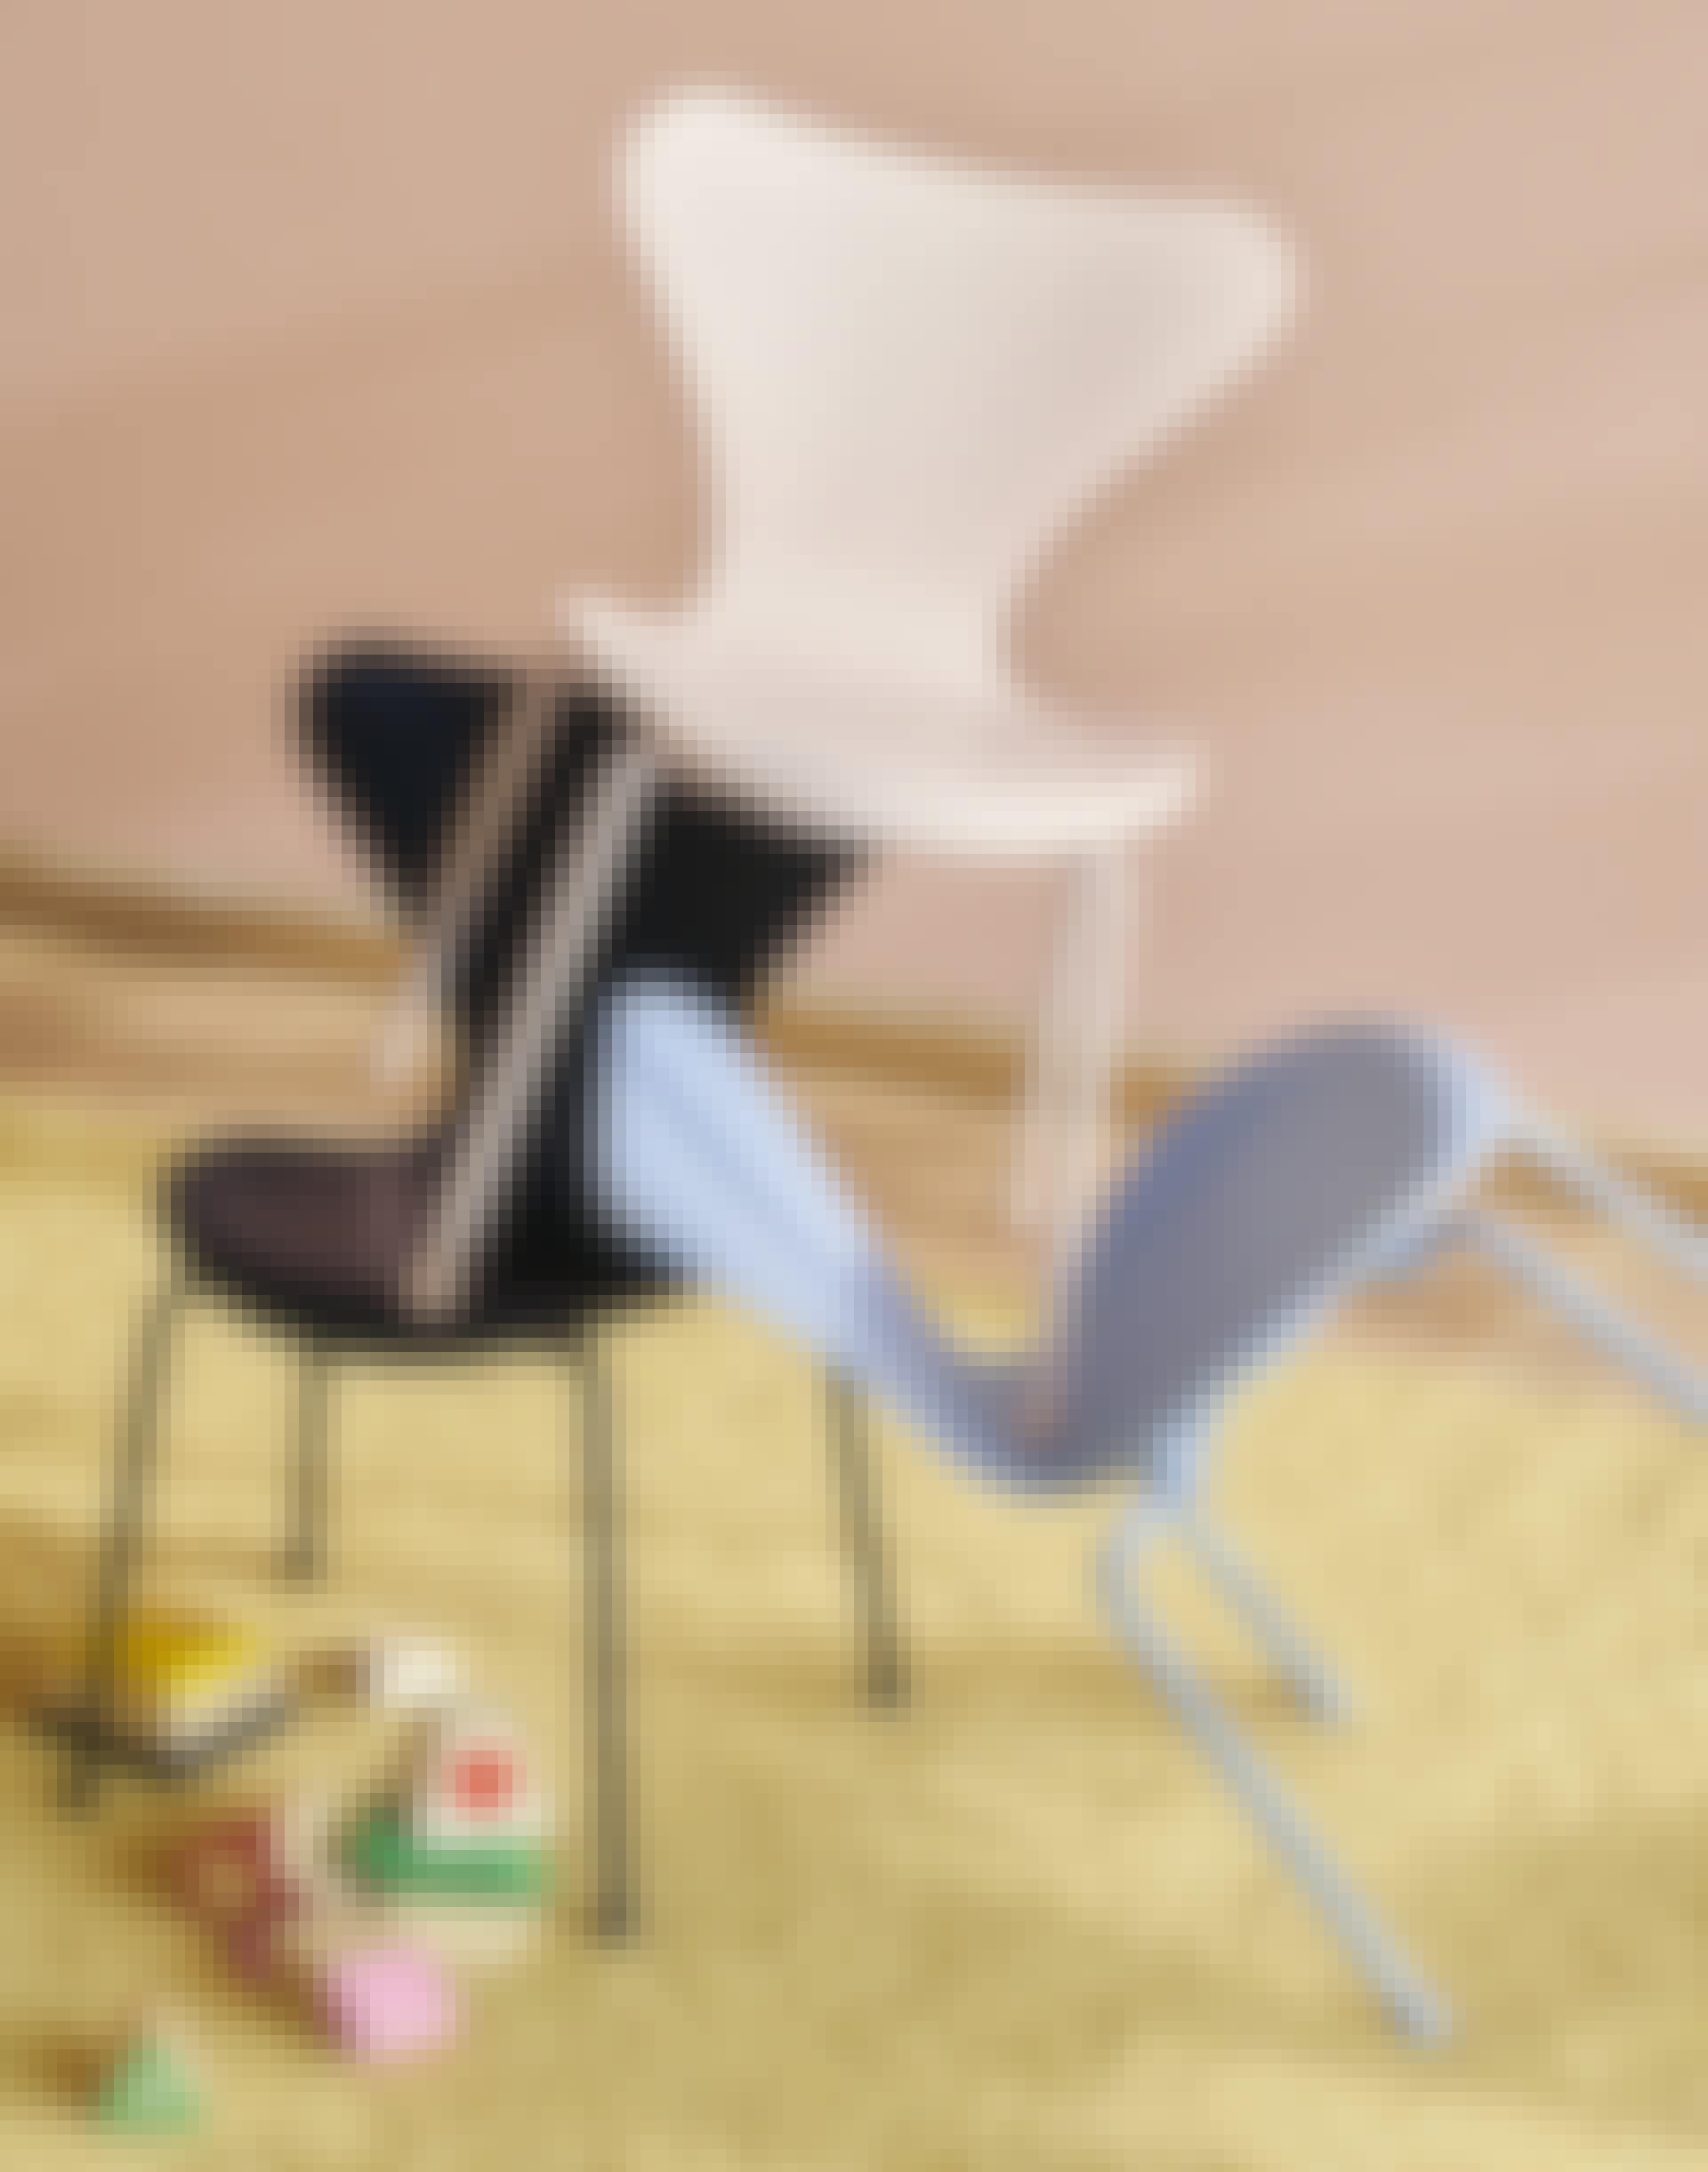 COS_2011_FH_Series-7_Childrens-Chair_Black_Rose_Lavender-Blue